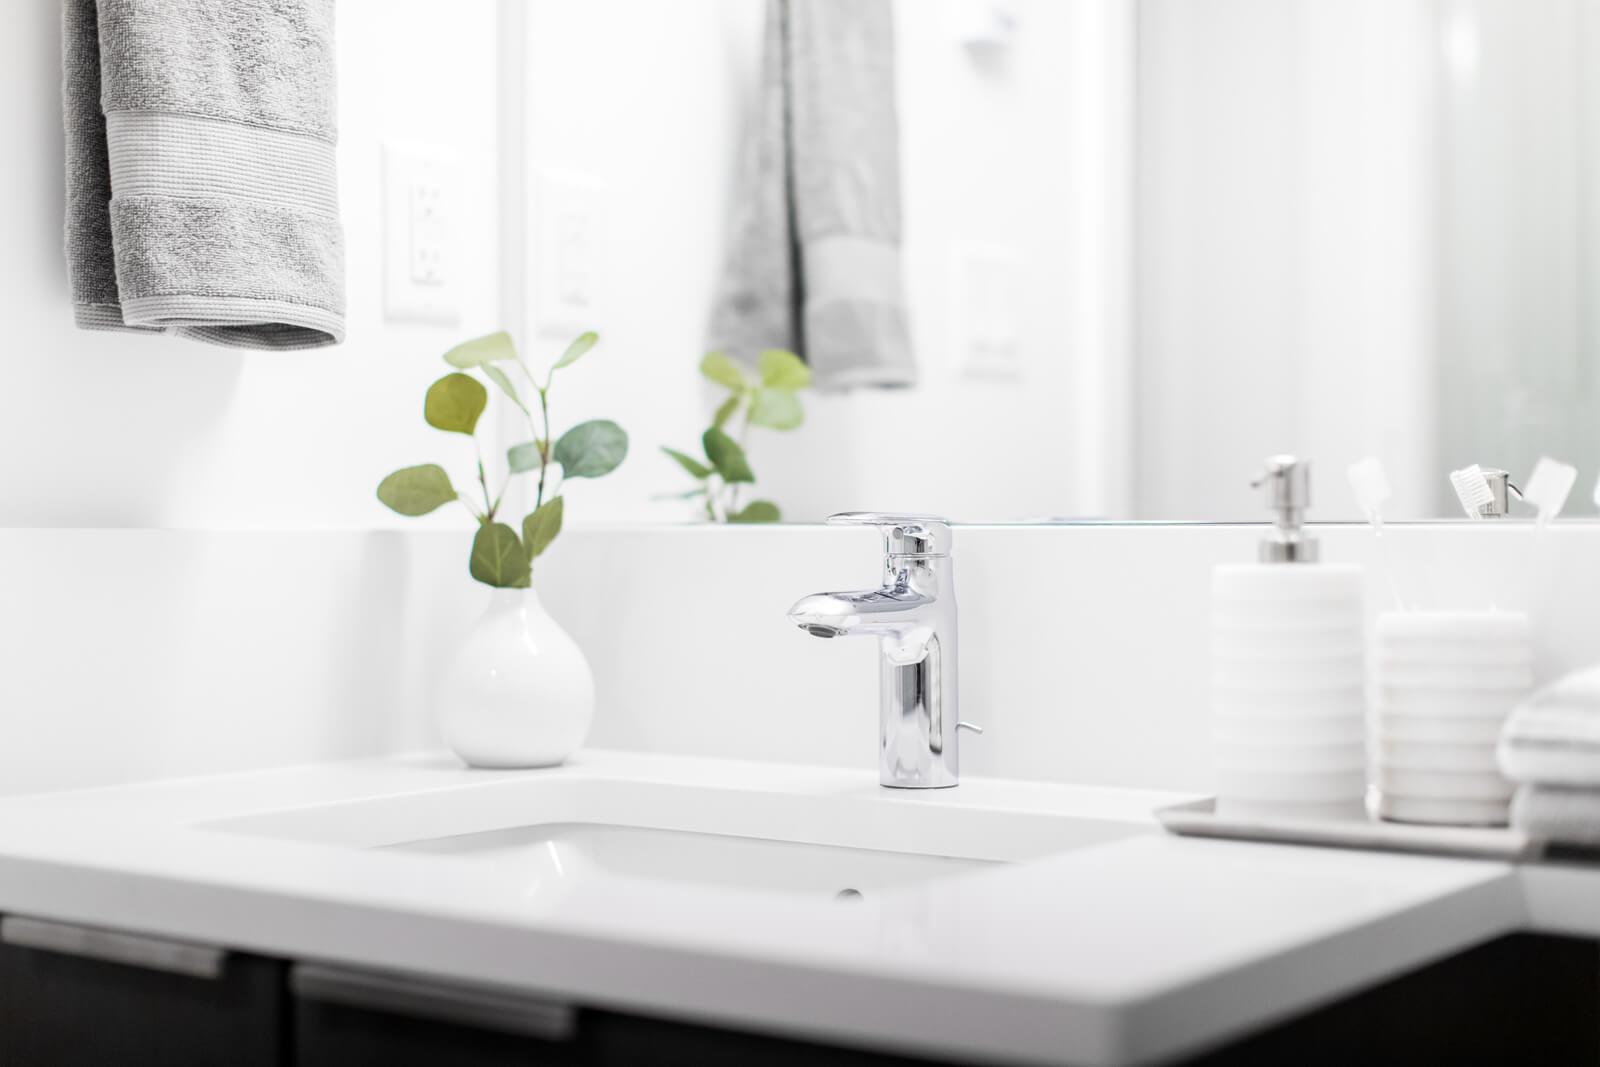 https://highpointeliving.ca/wp-content/uploads/2019/07/Bathroom.jpg